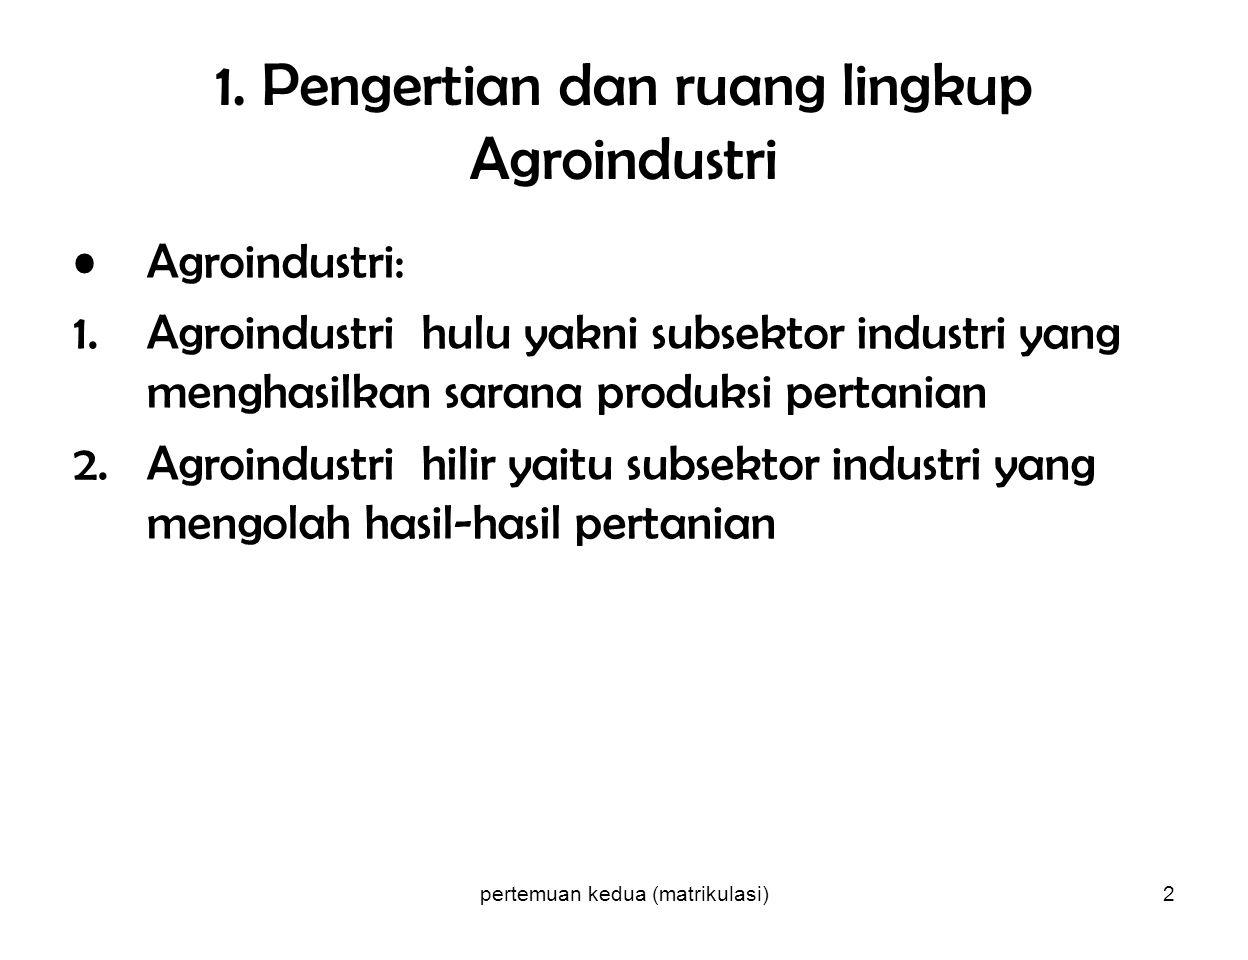 1. Pengertian dan ruang lingkup Agroindustri